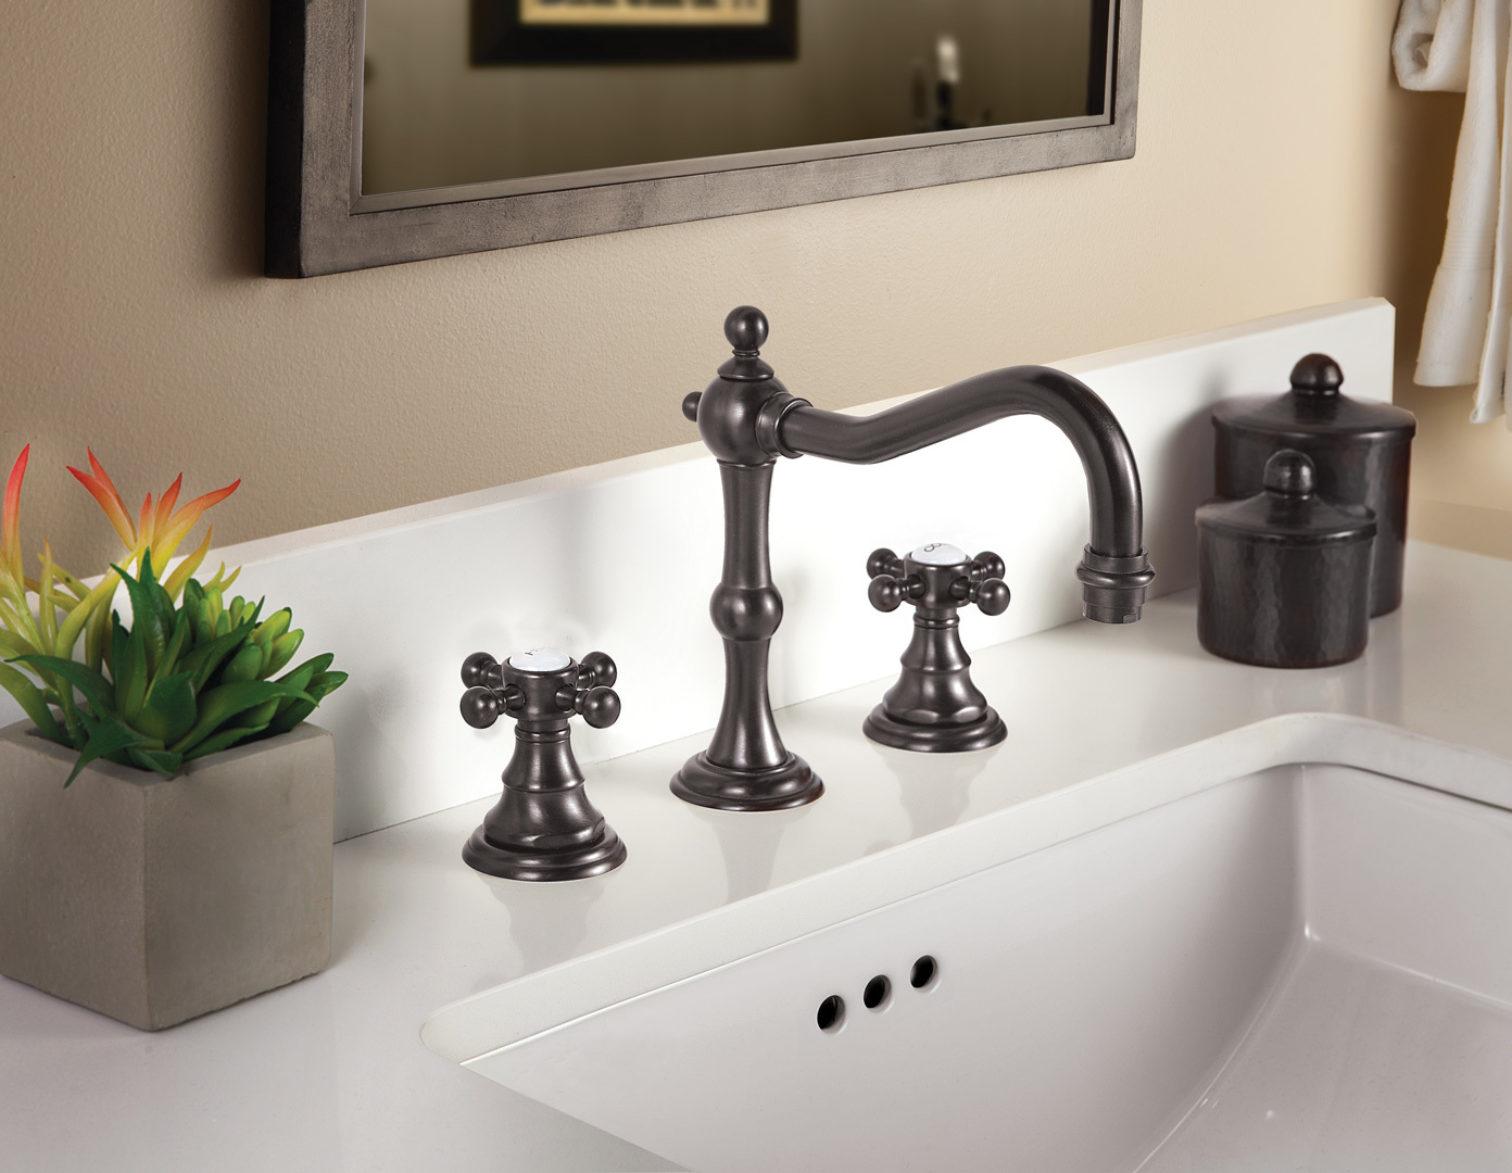 Montecito widespread faucet in rustico bronze